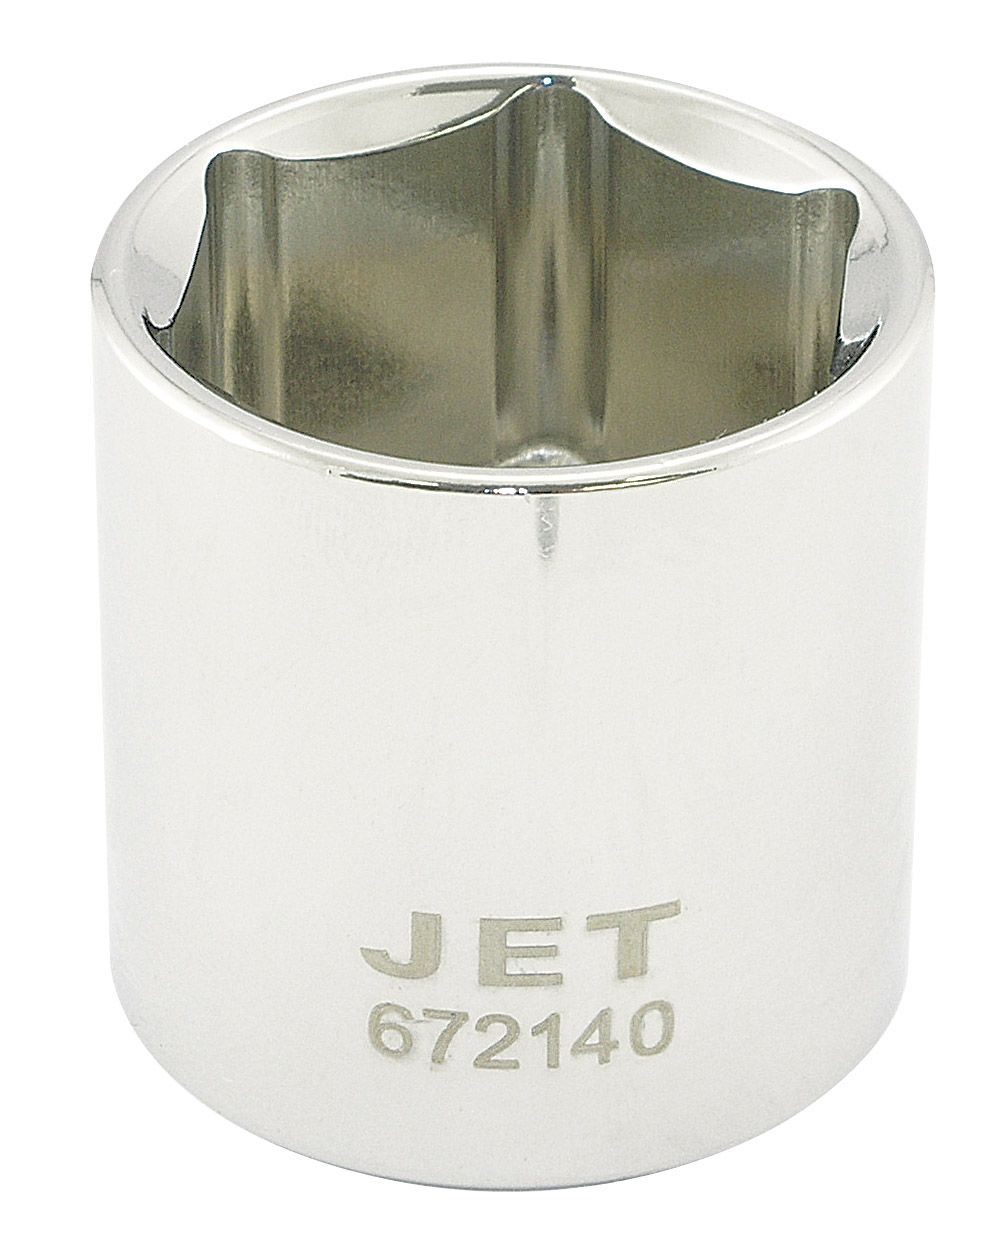 Jet 672112 Douille 3/8